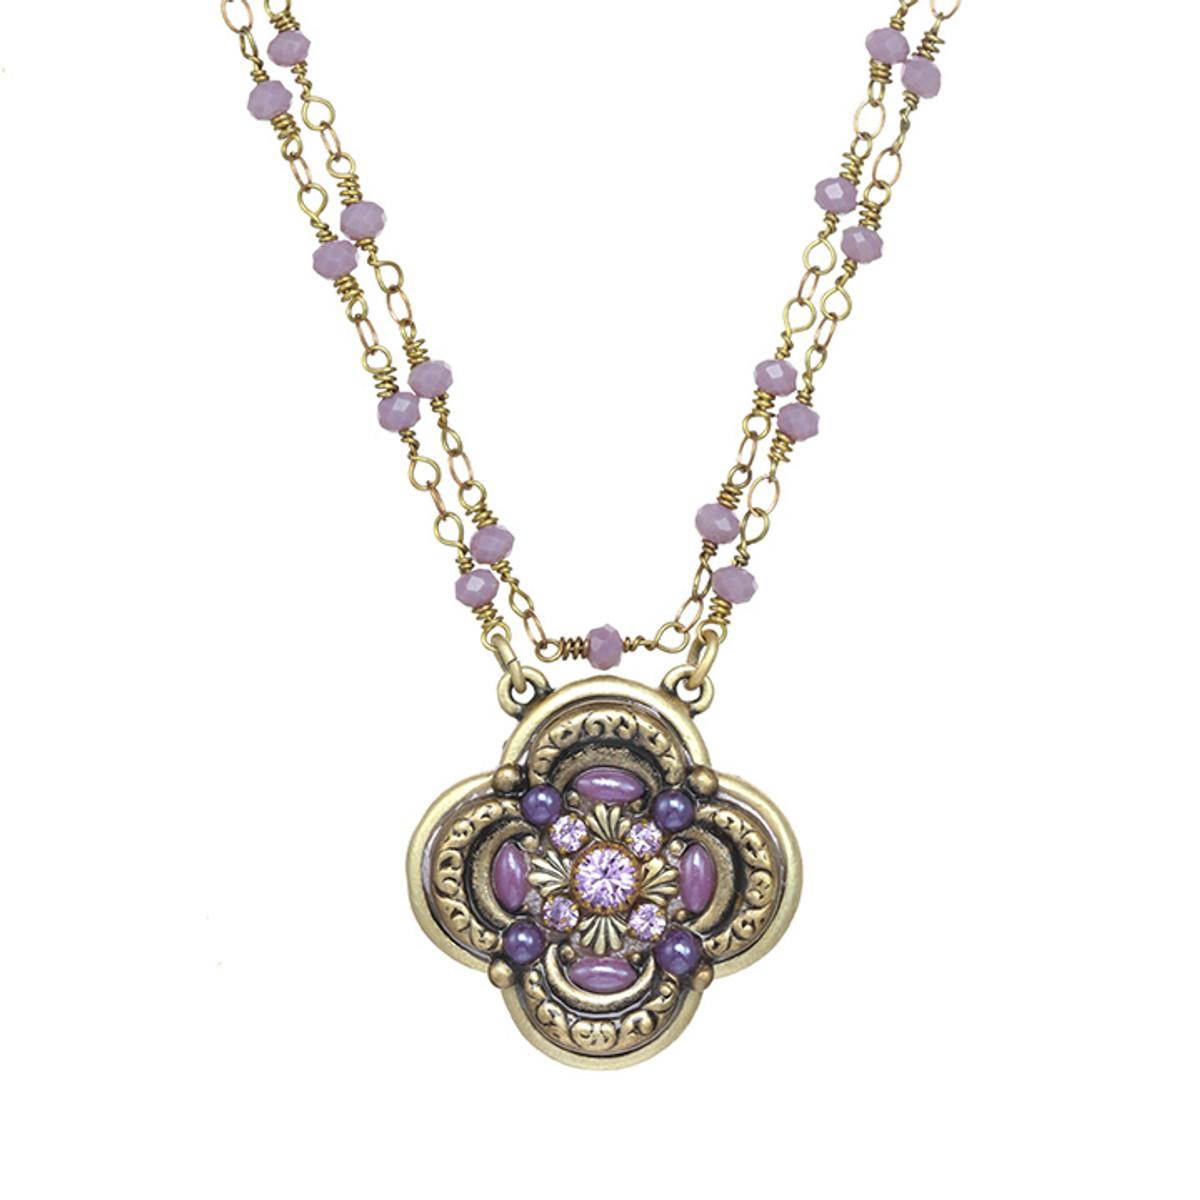 Michal Golan Michal Golan Lilac Flower Pendant Necklace